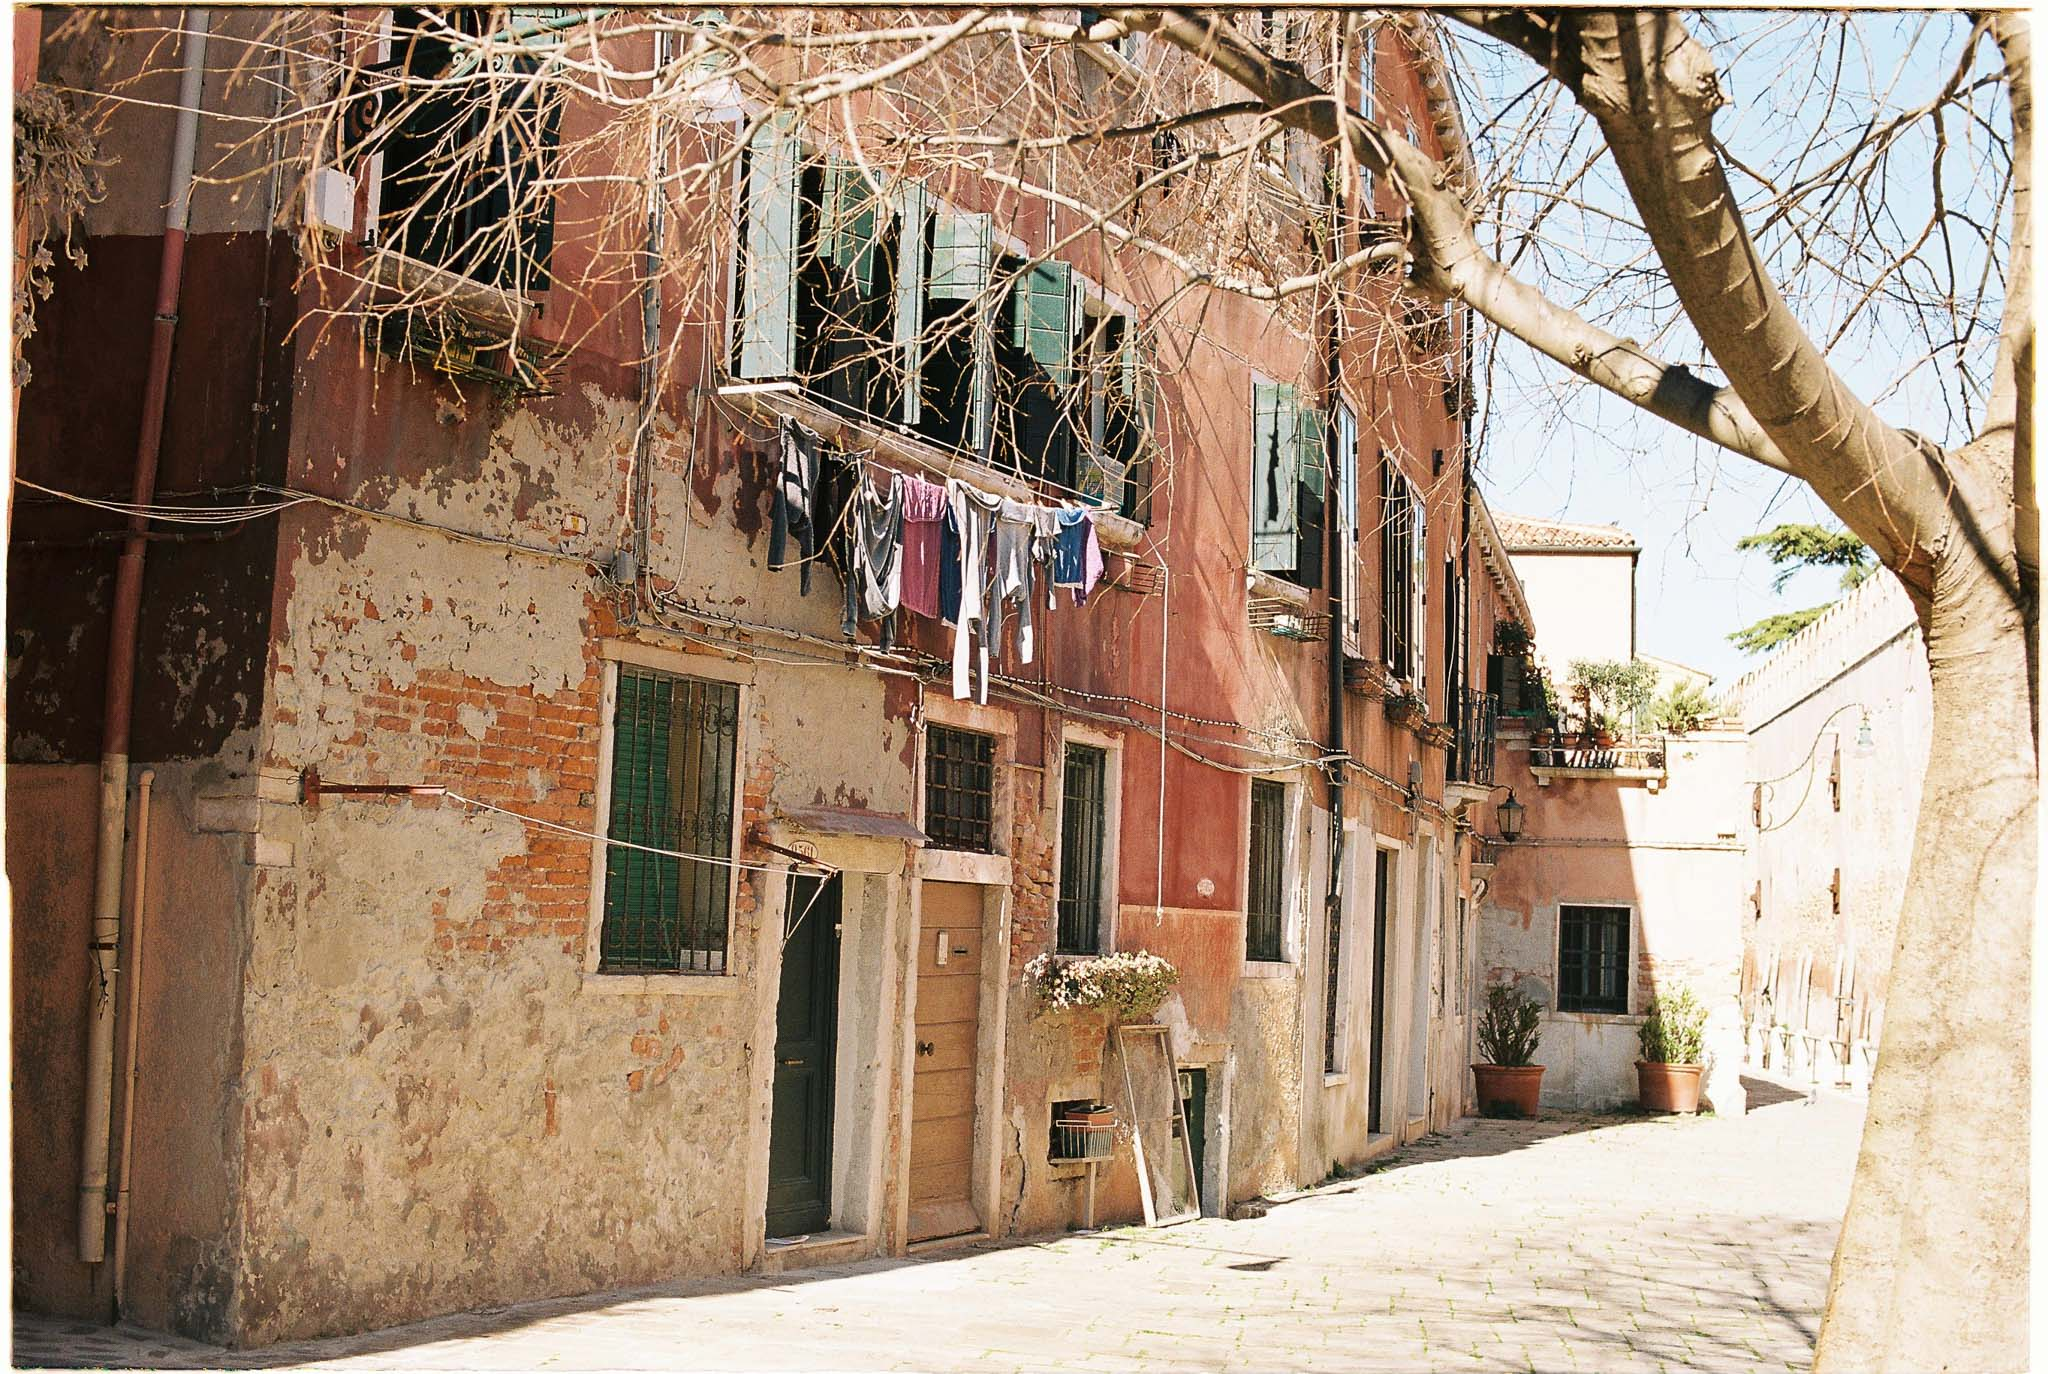 Venice streets - Kodak Portra 160